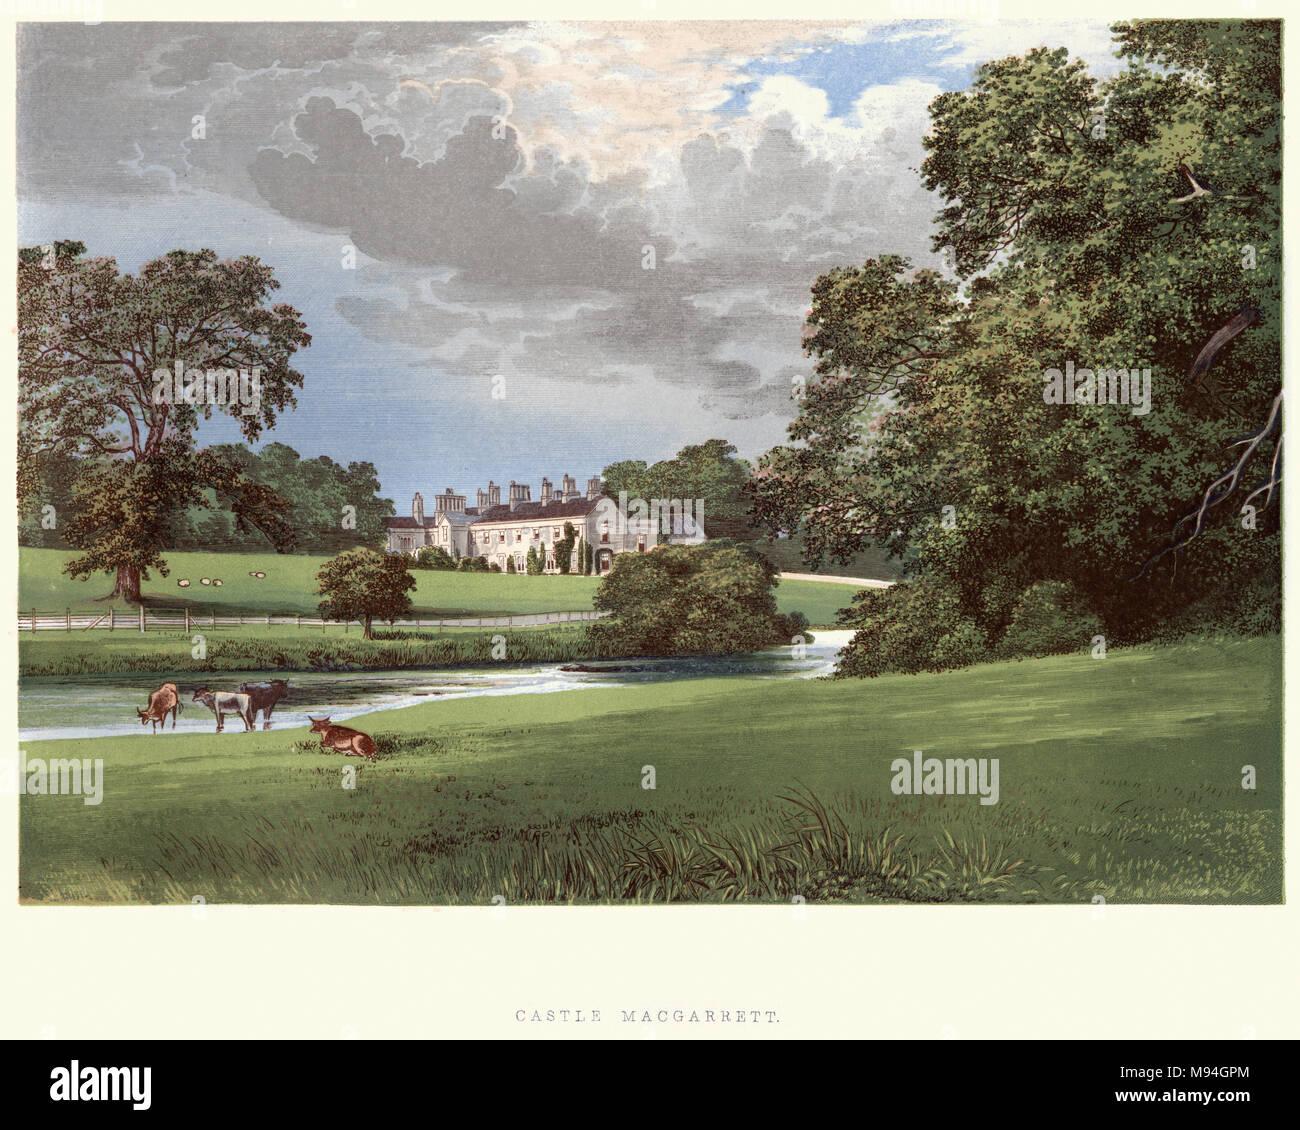 Castillo MacGarrett County Mayo, Irlanda del siglo XIX. Imagen De Stock